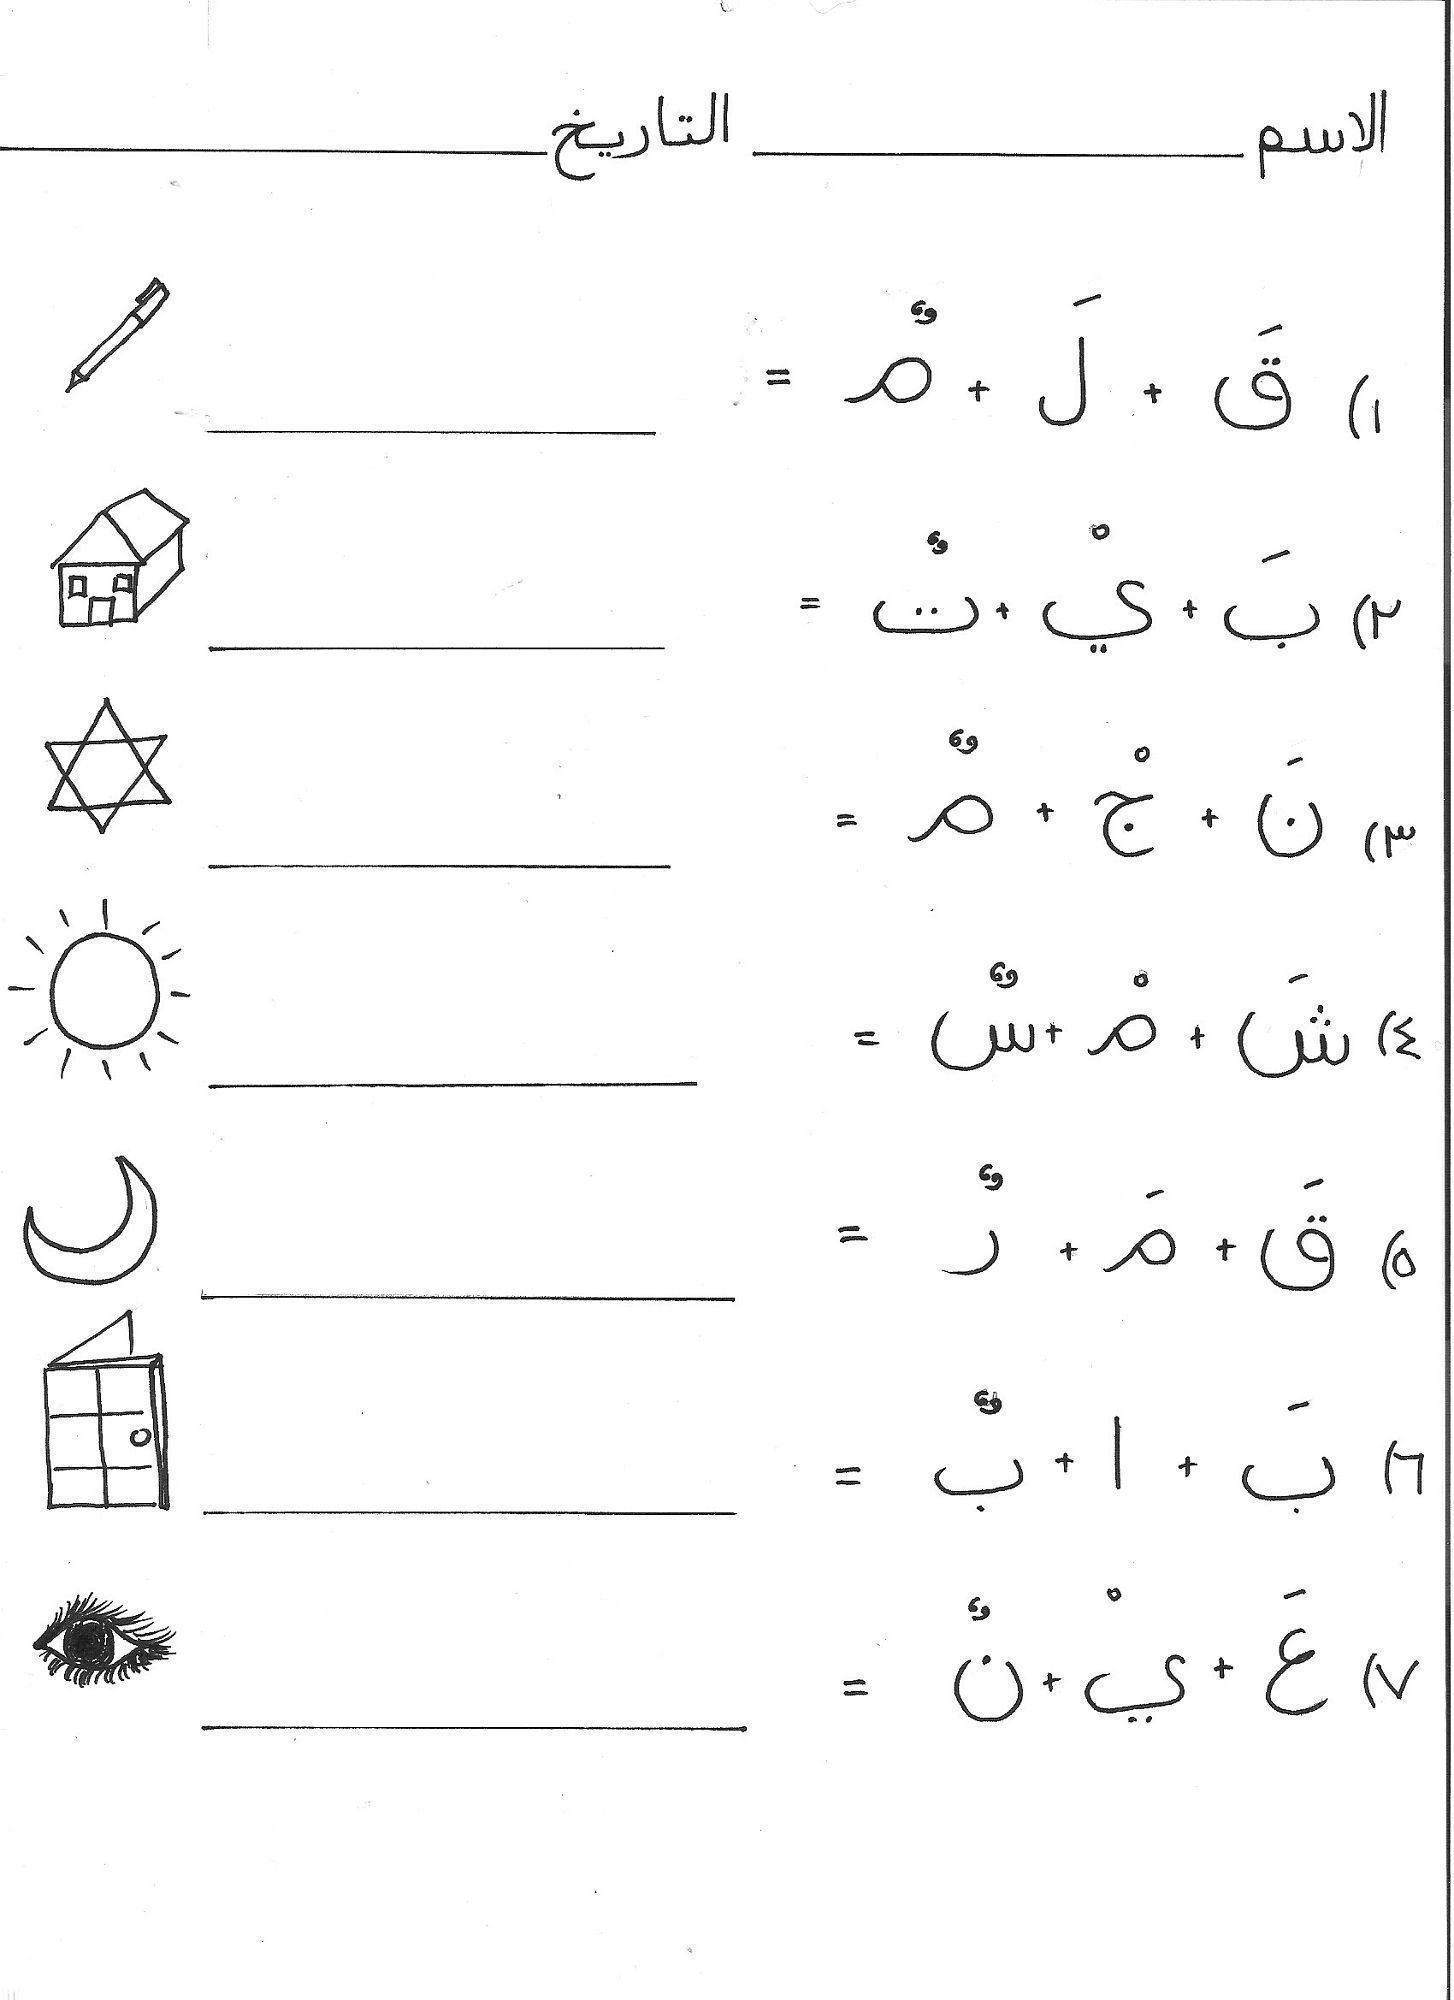 Worksheets Arabic Alphabet Worksheets arabic alphabet worksheets activity shelter learnarabicactivities learnarabicworksheets